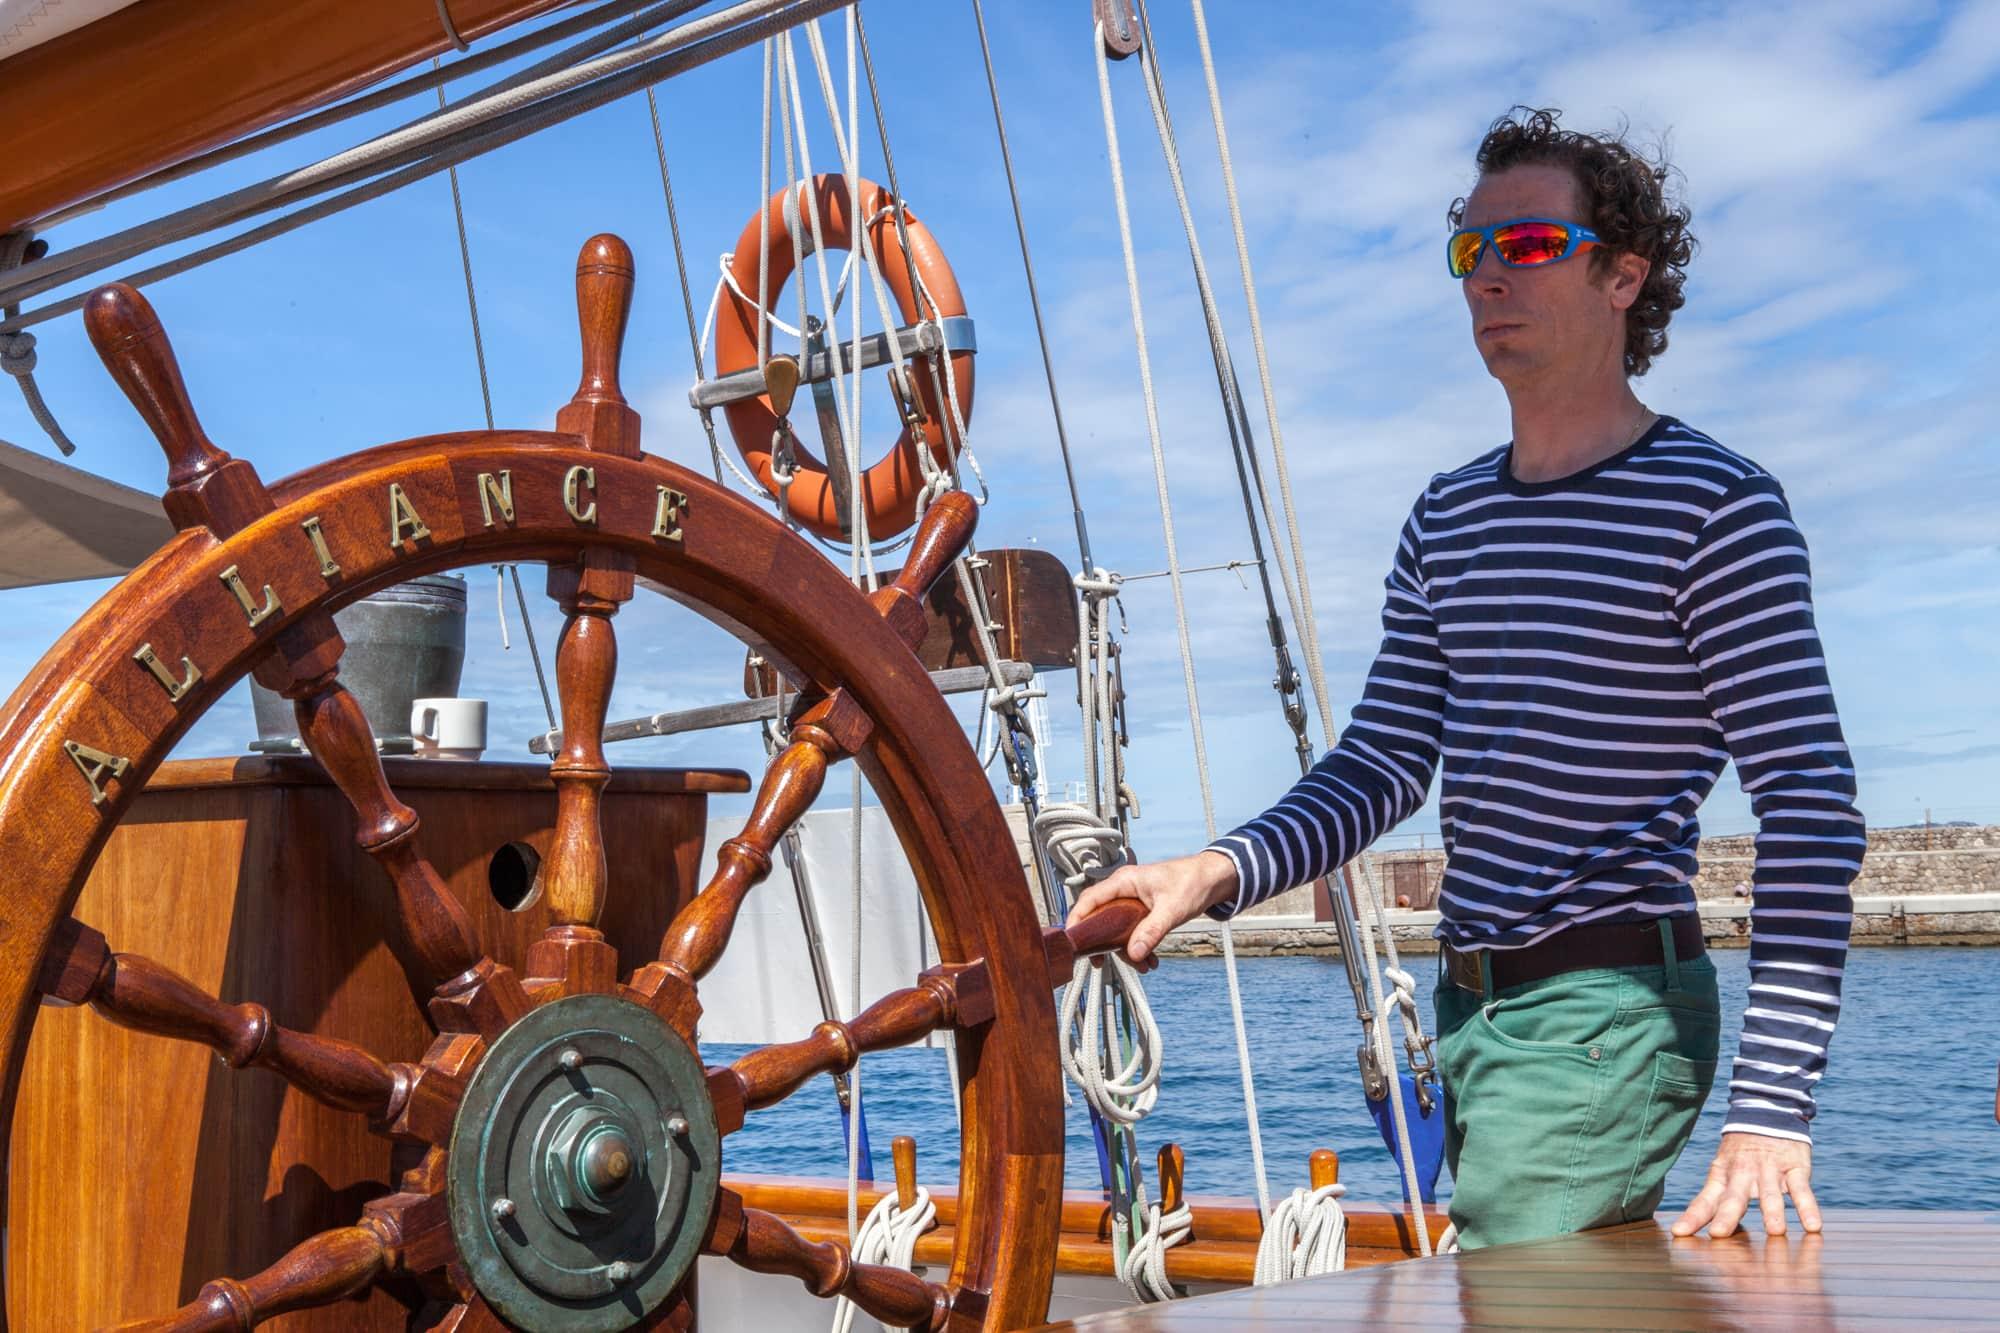 mer-voilier-sortie-marseille-calanques